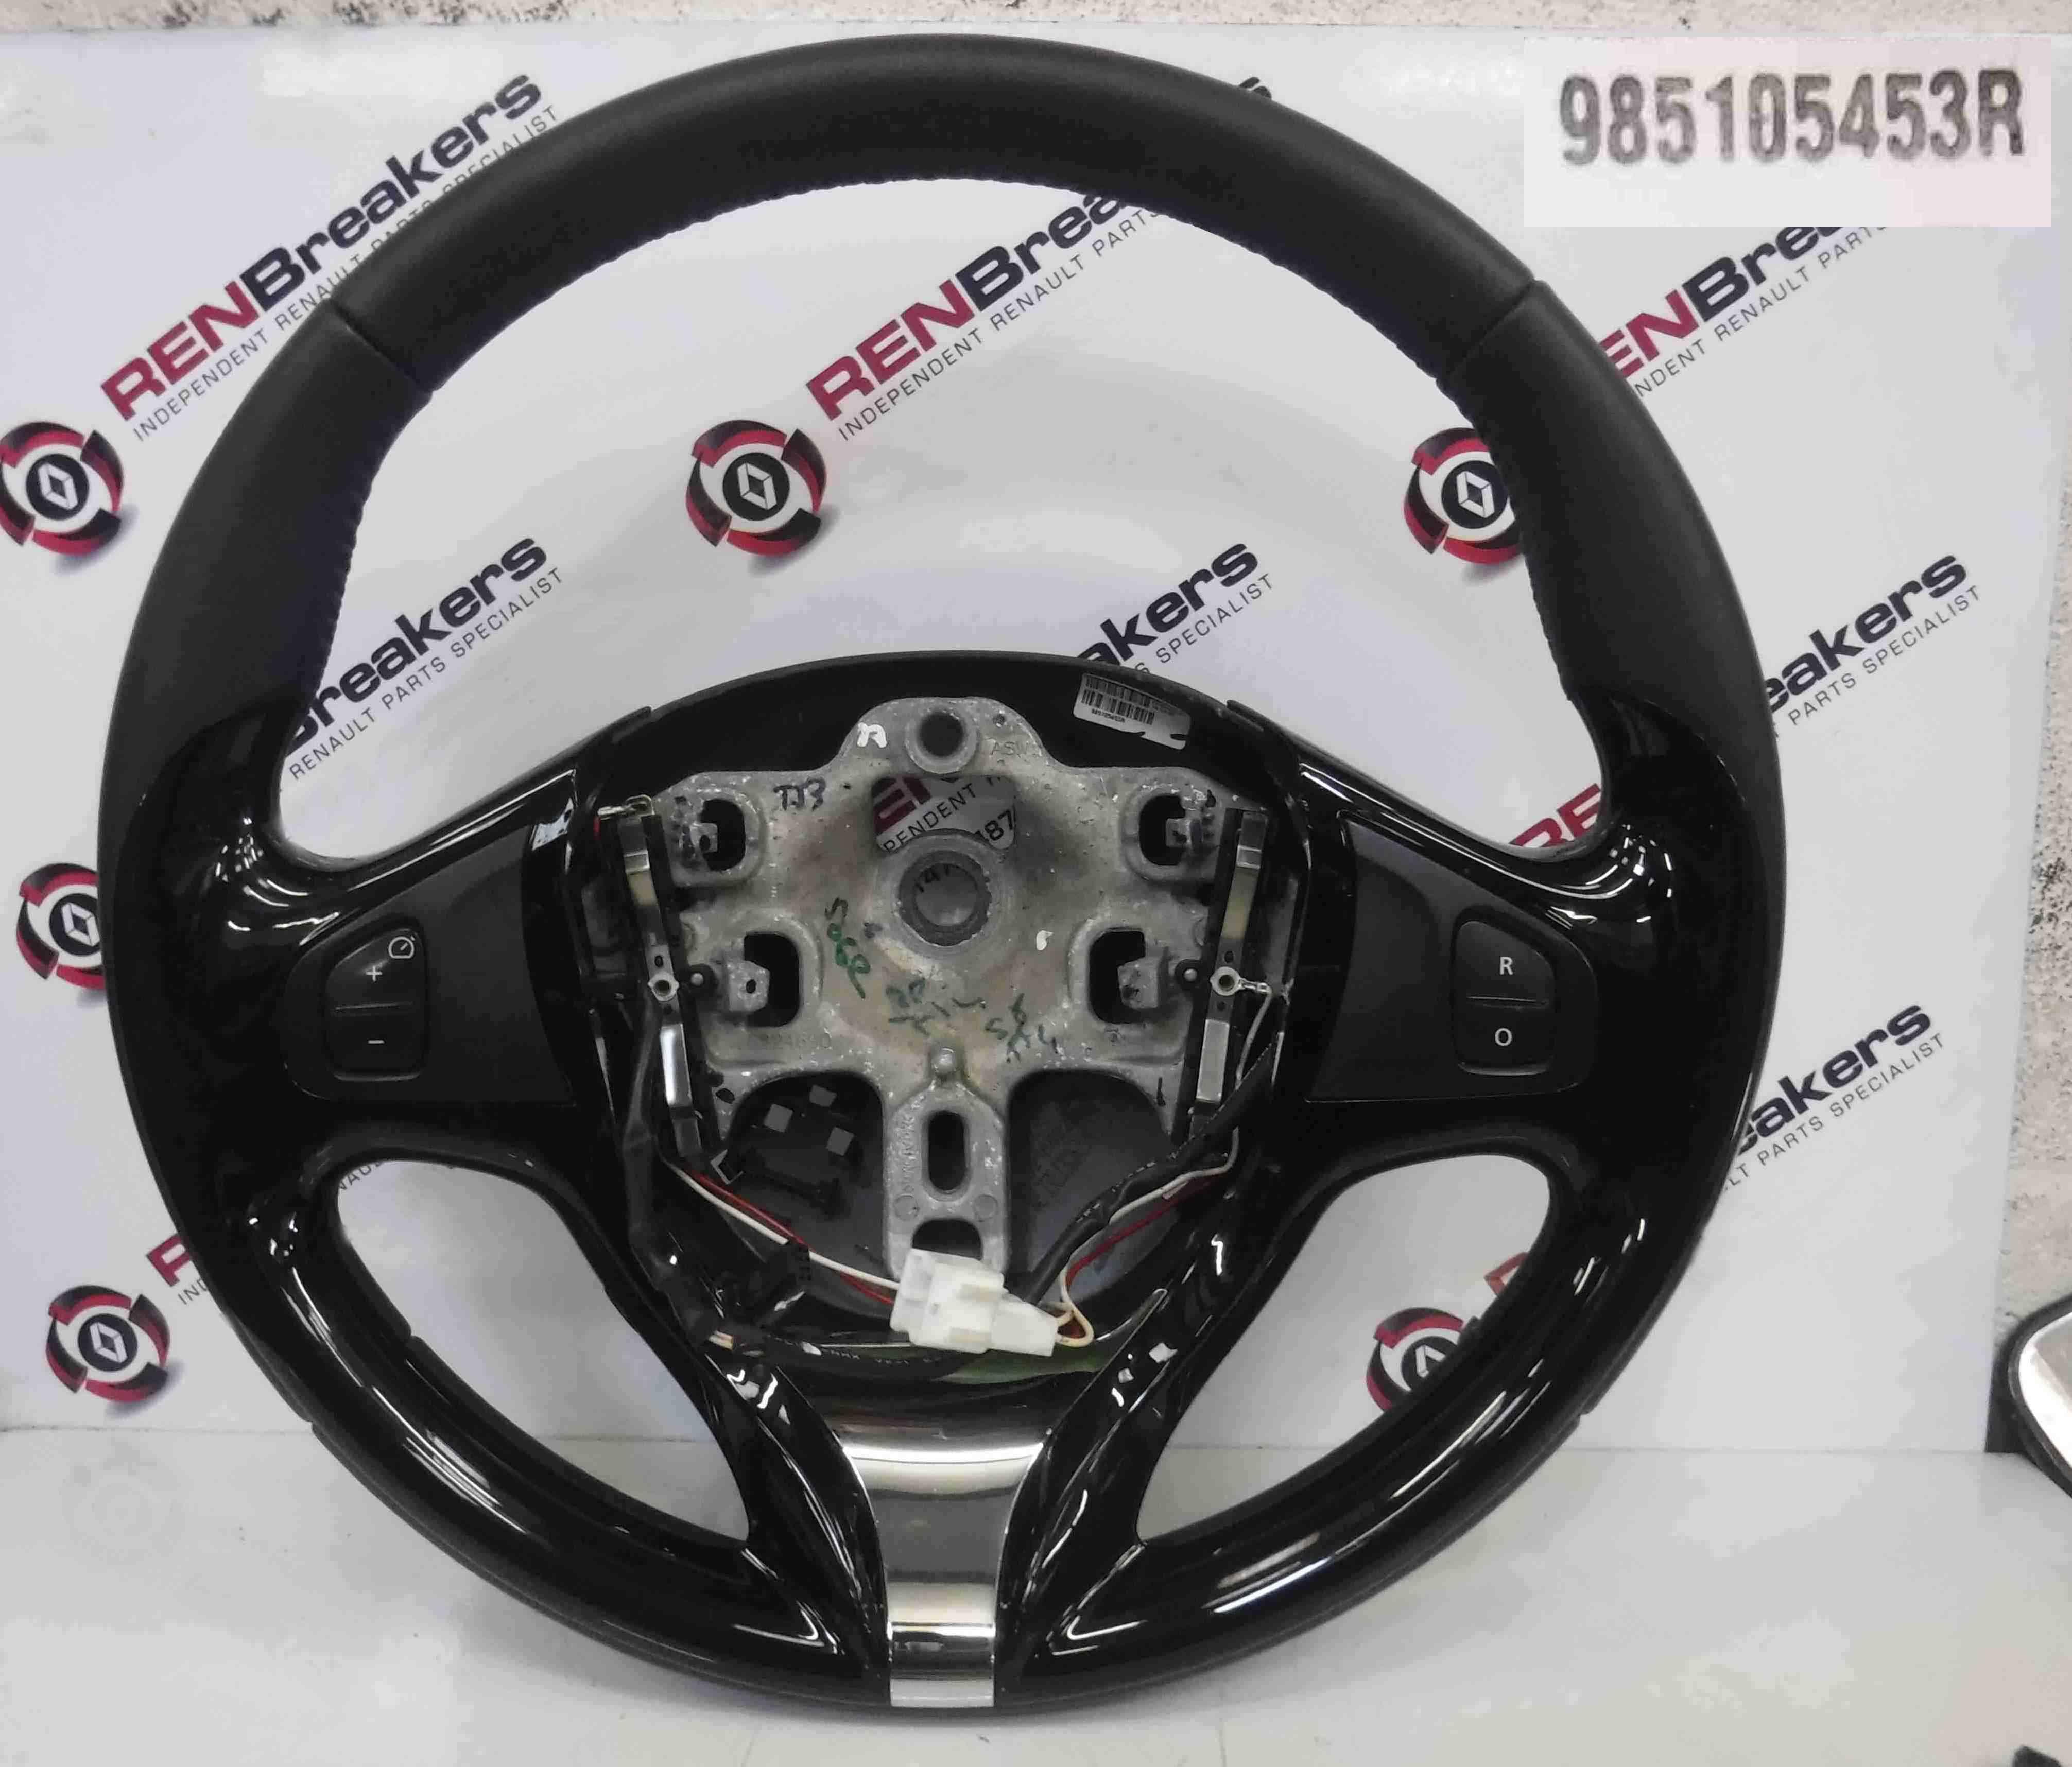 Renault Captur 2013-2015 Steering Wheel Black Chrome Cruise ControlR 985105453